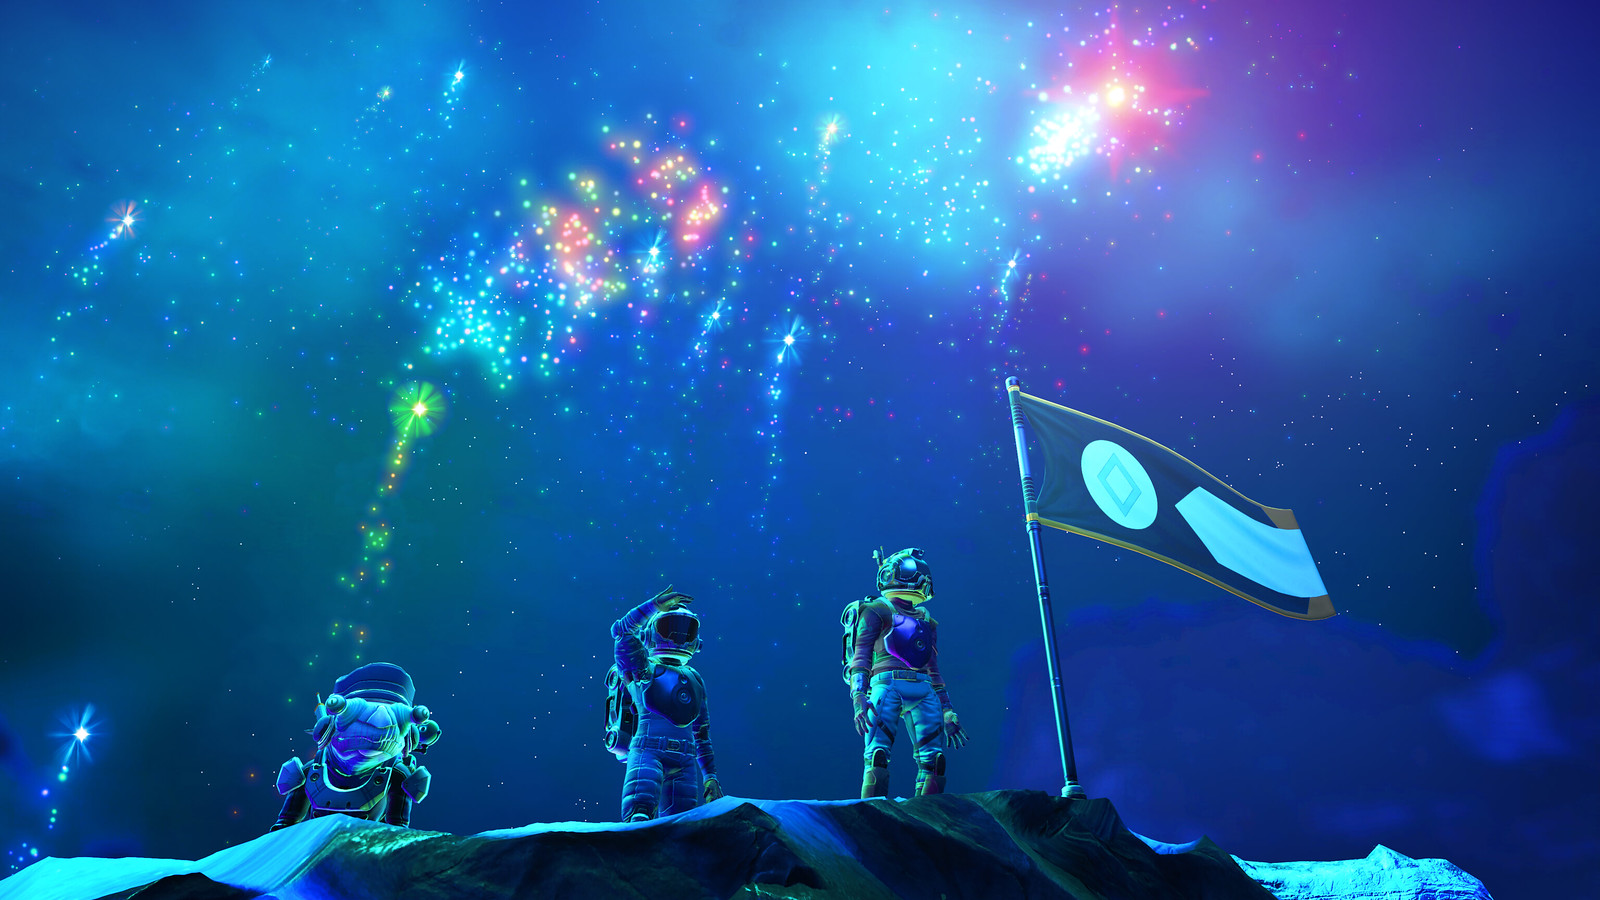 No Man's Sky: Visions